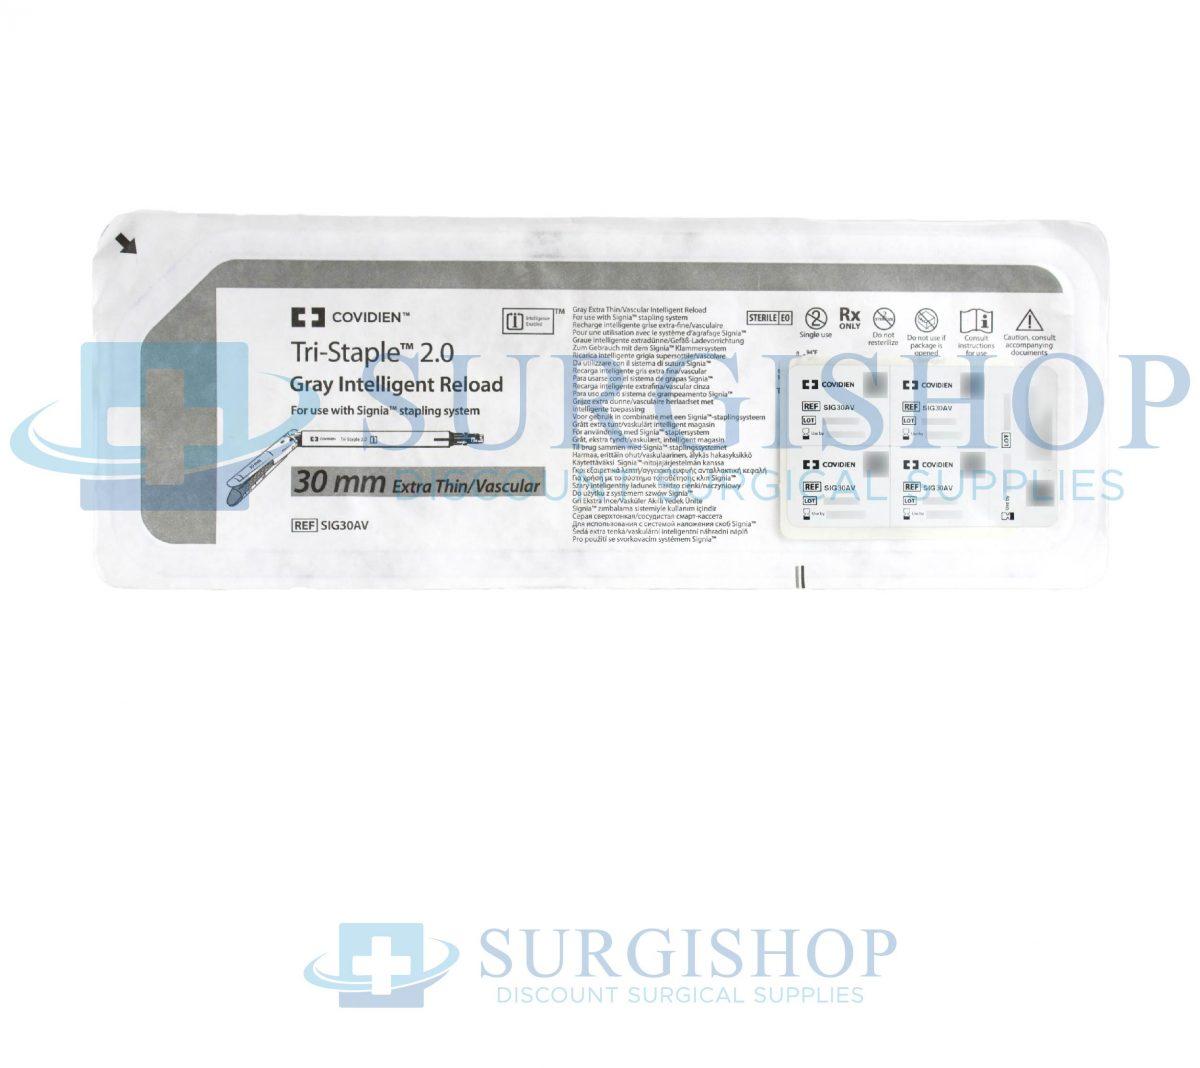 Covidien Signia Tri-Staple 2.0 Extra-Thin/Vascular Reload 30.0mm (Gray)